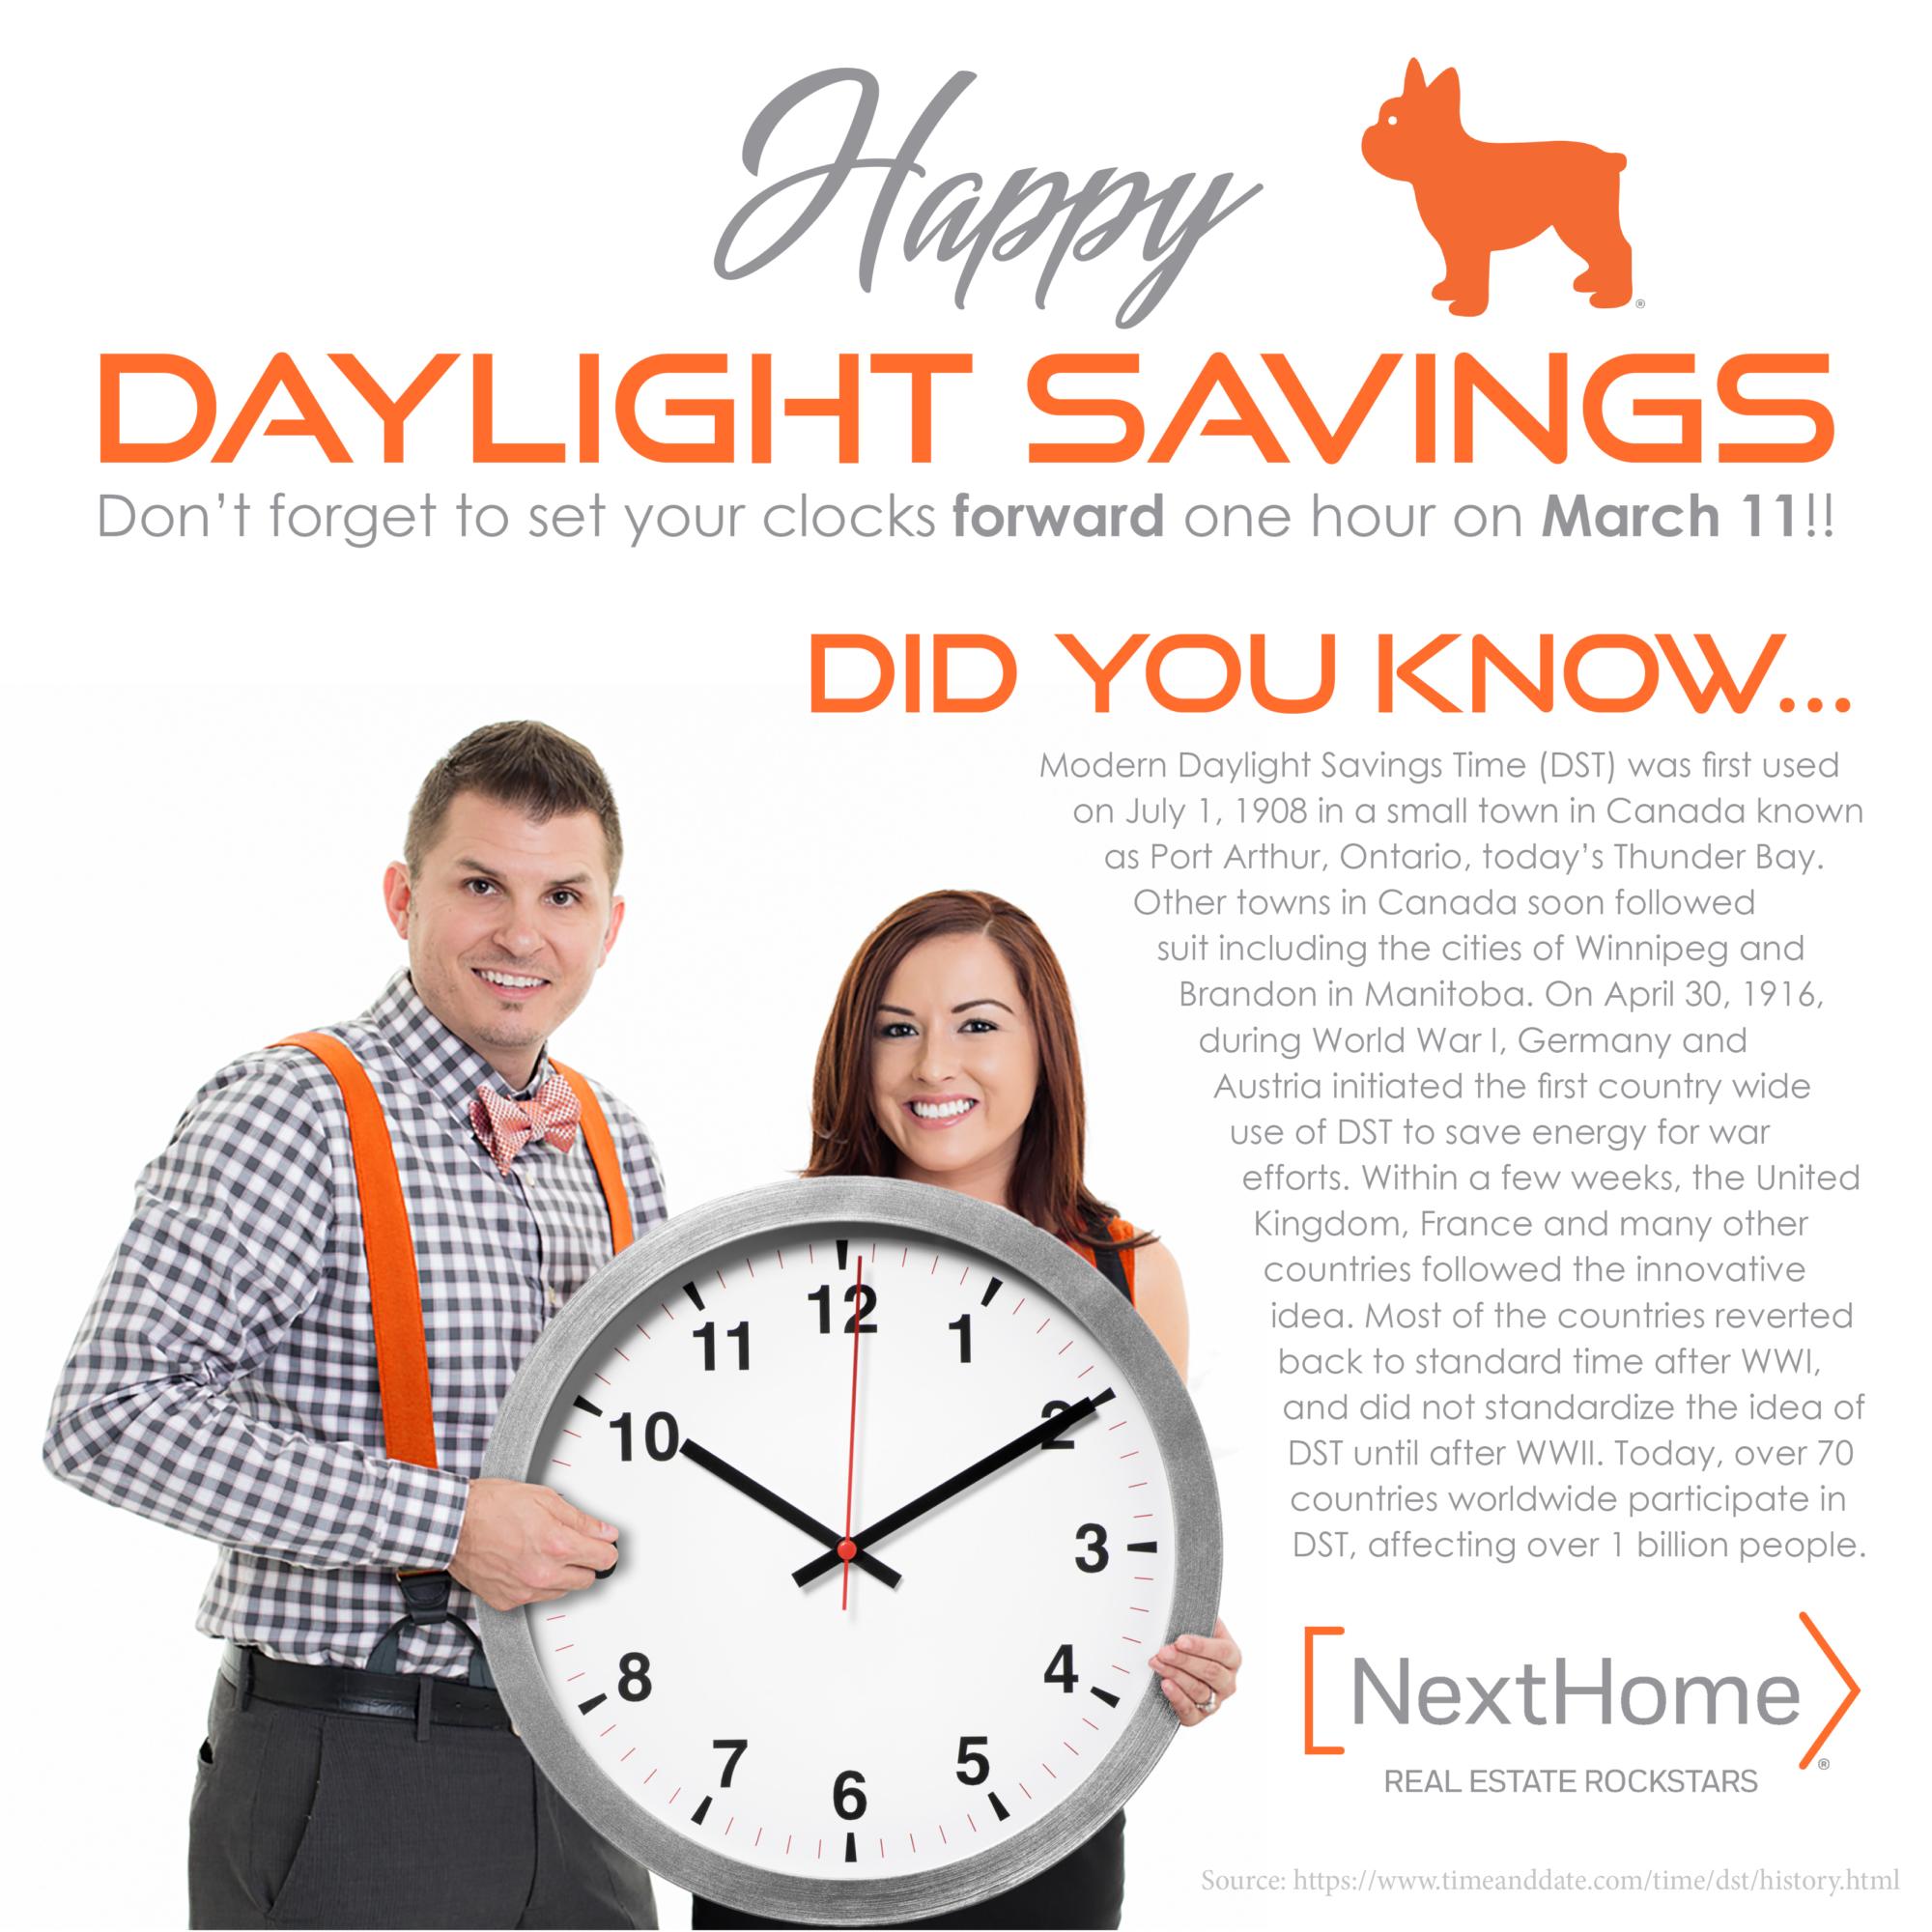 Cherrie-Zach-Real-Estate-Rockstars-NextHome-Happy-Daylight-Savings-March-2018-History.png